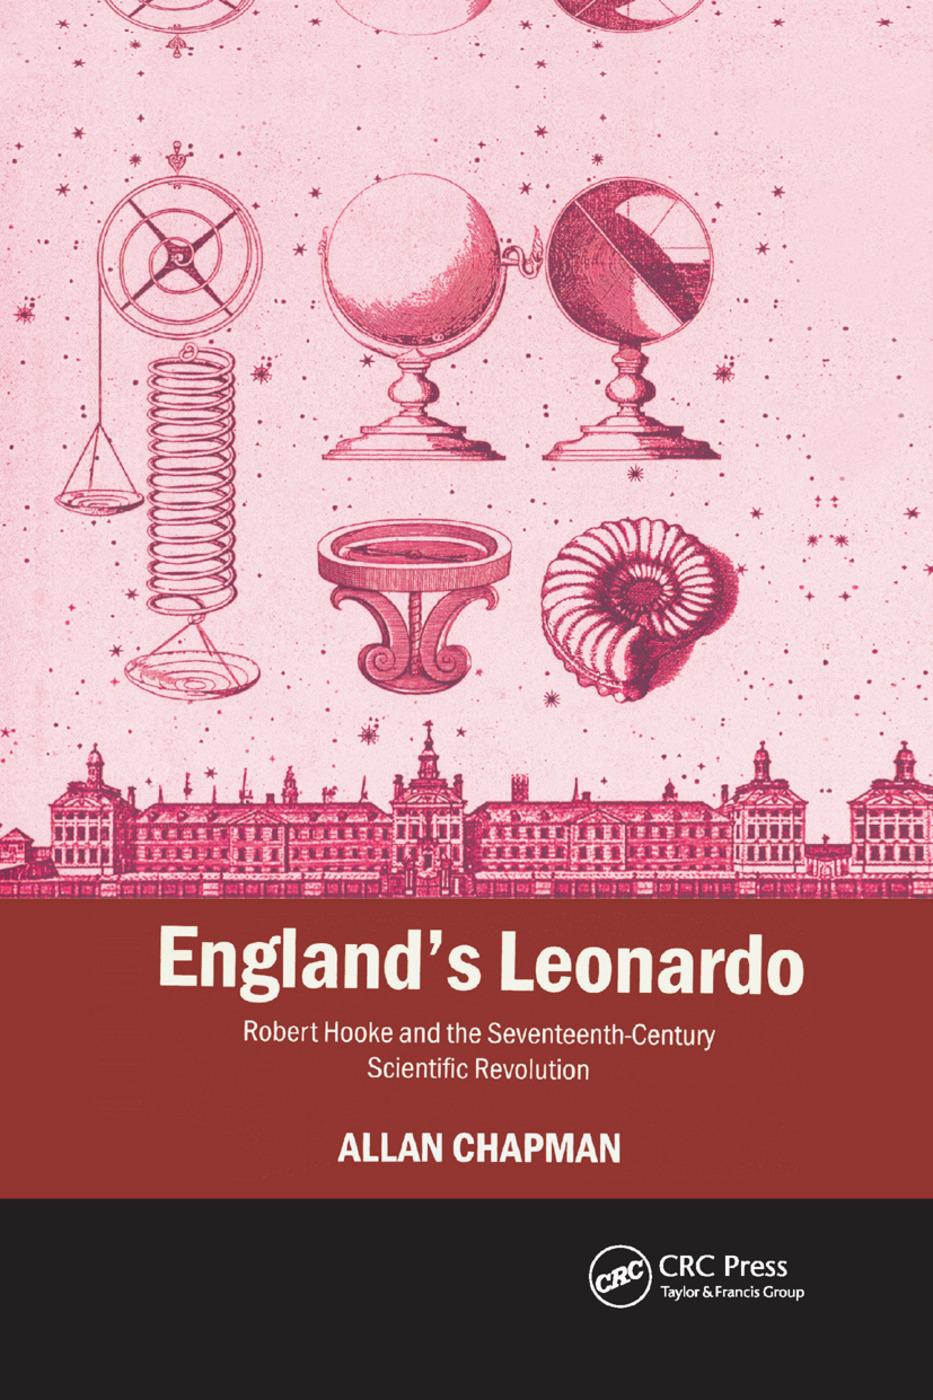 England's Leonardo: Robert Hooke and the Seventeenth-Century Scientific Revolution book cover